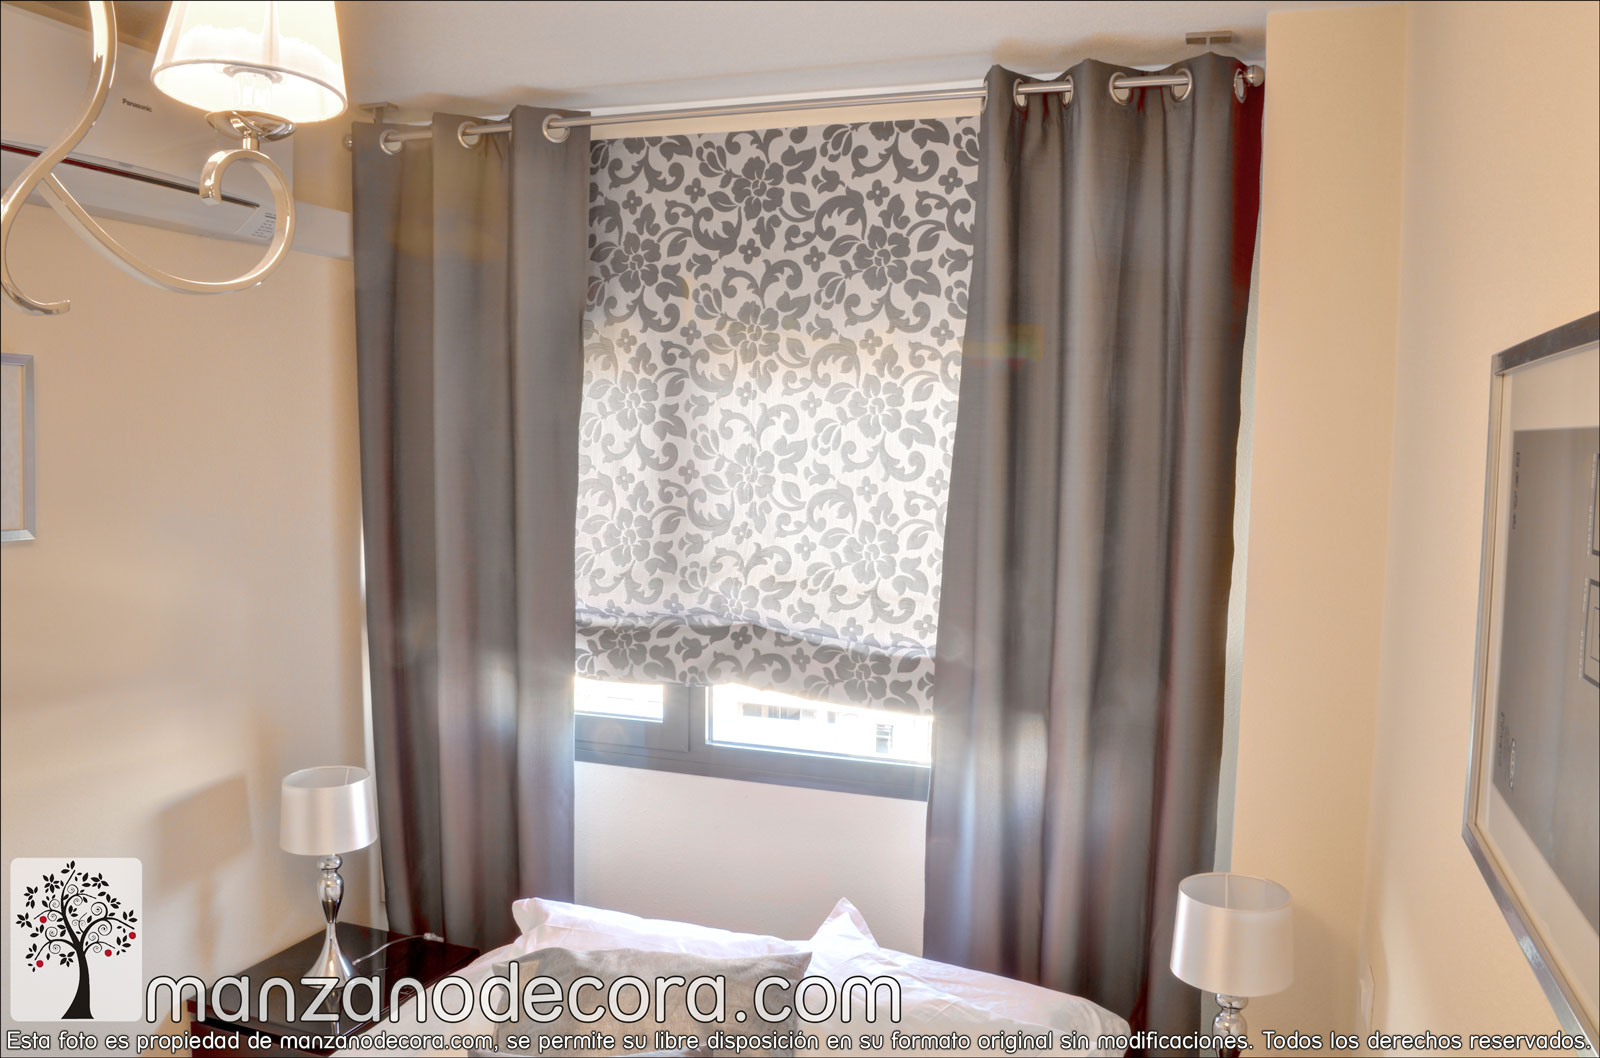 Cortinas cortinas manzanodecora - Ollaos para cortinas ...